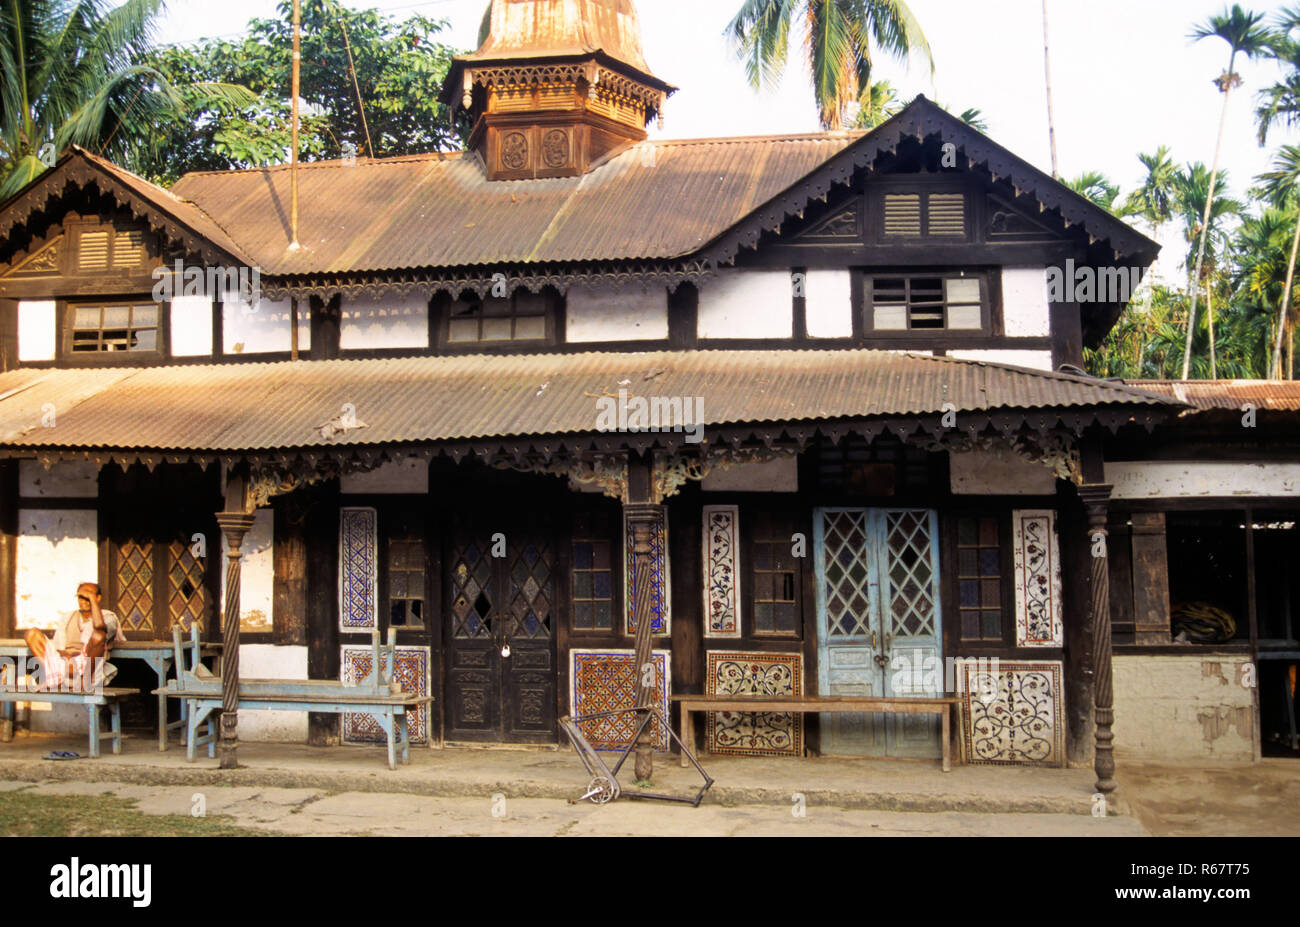 Maison construite en 1983, Guwahati, Assam, Inde Photo Stock